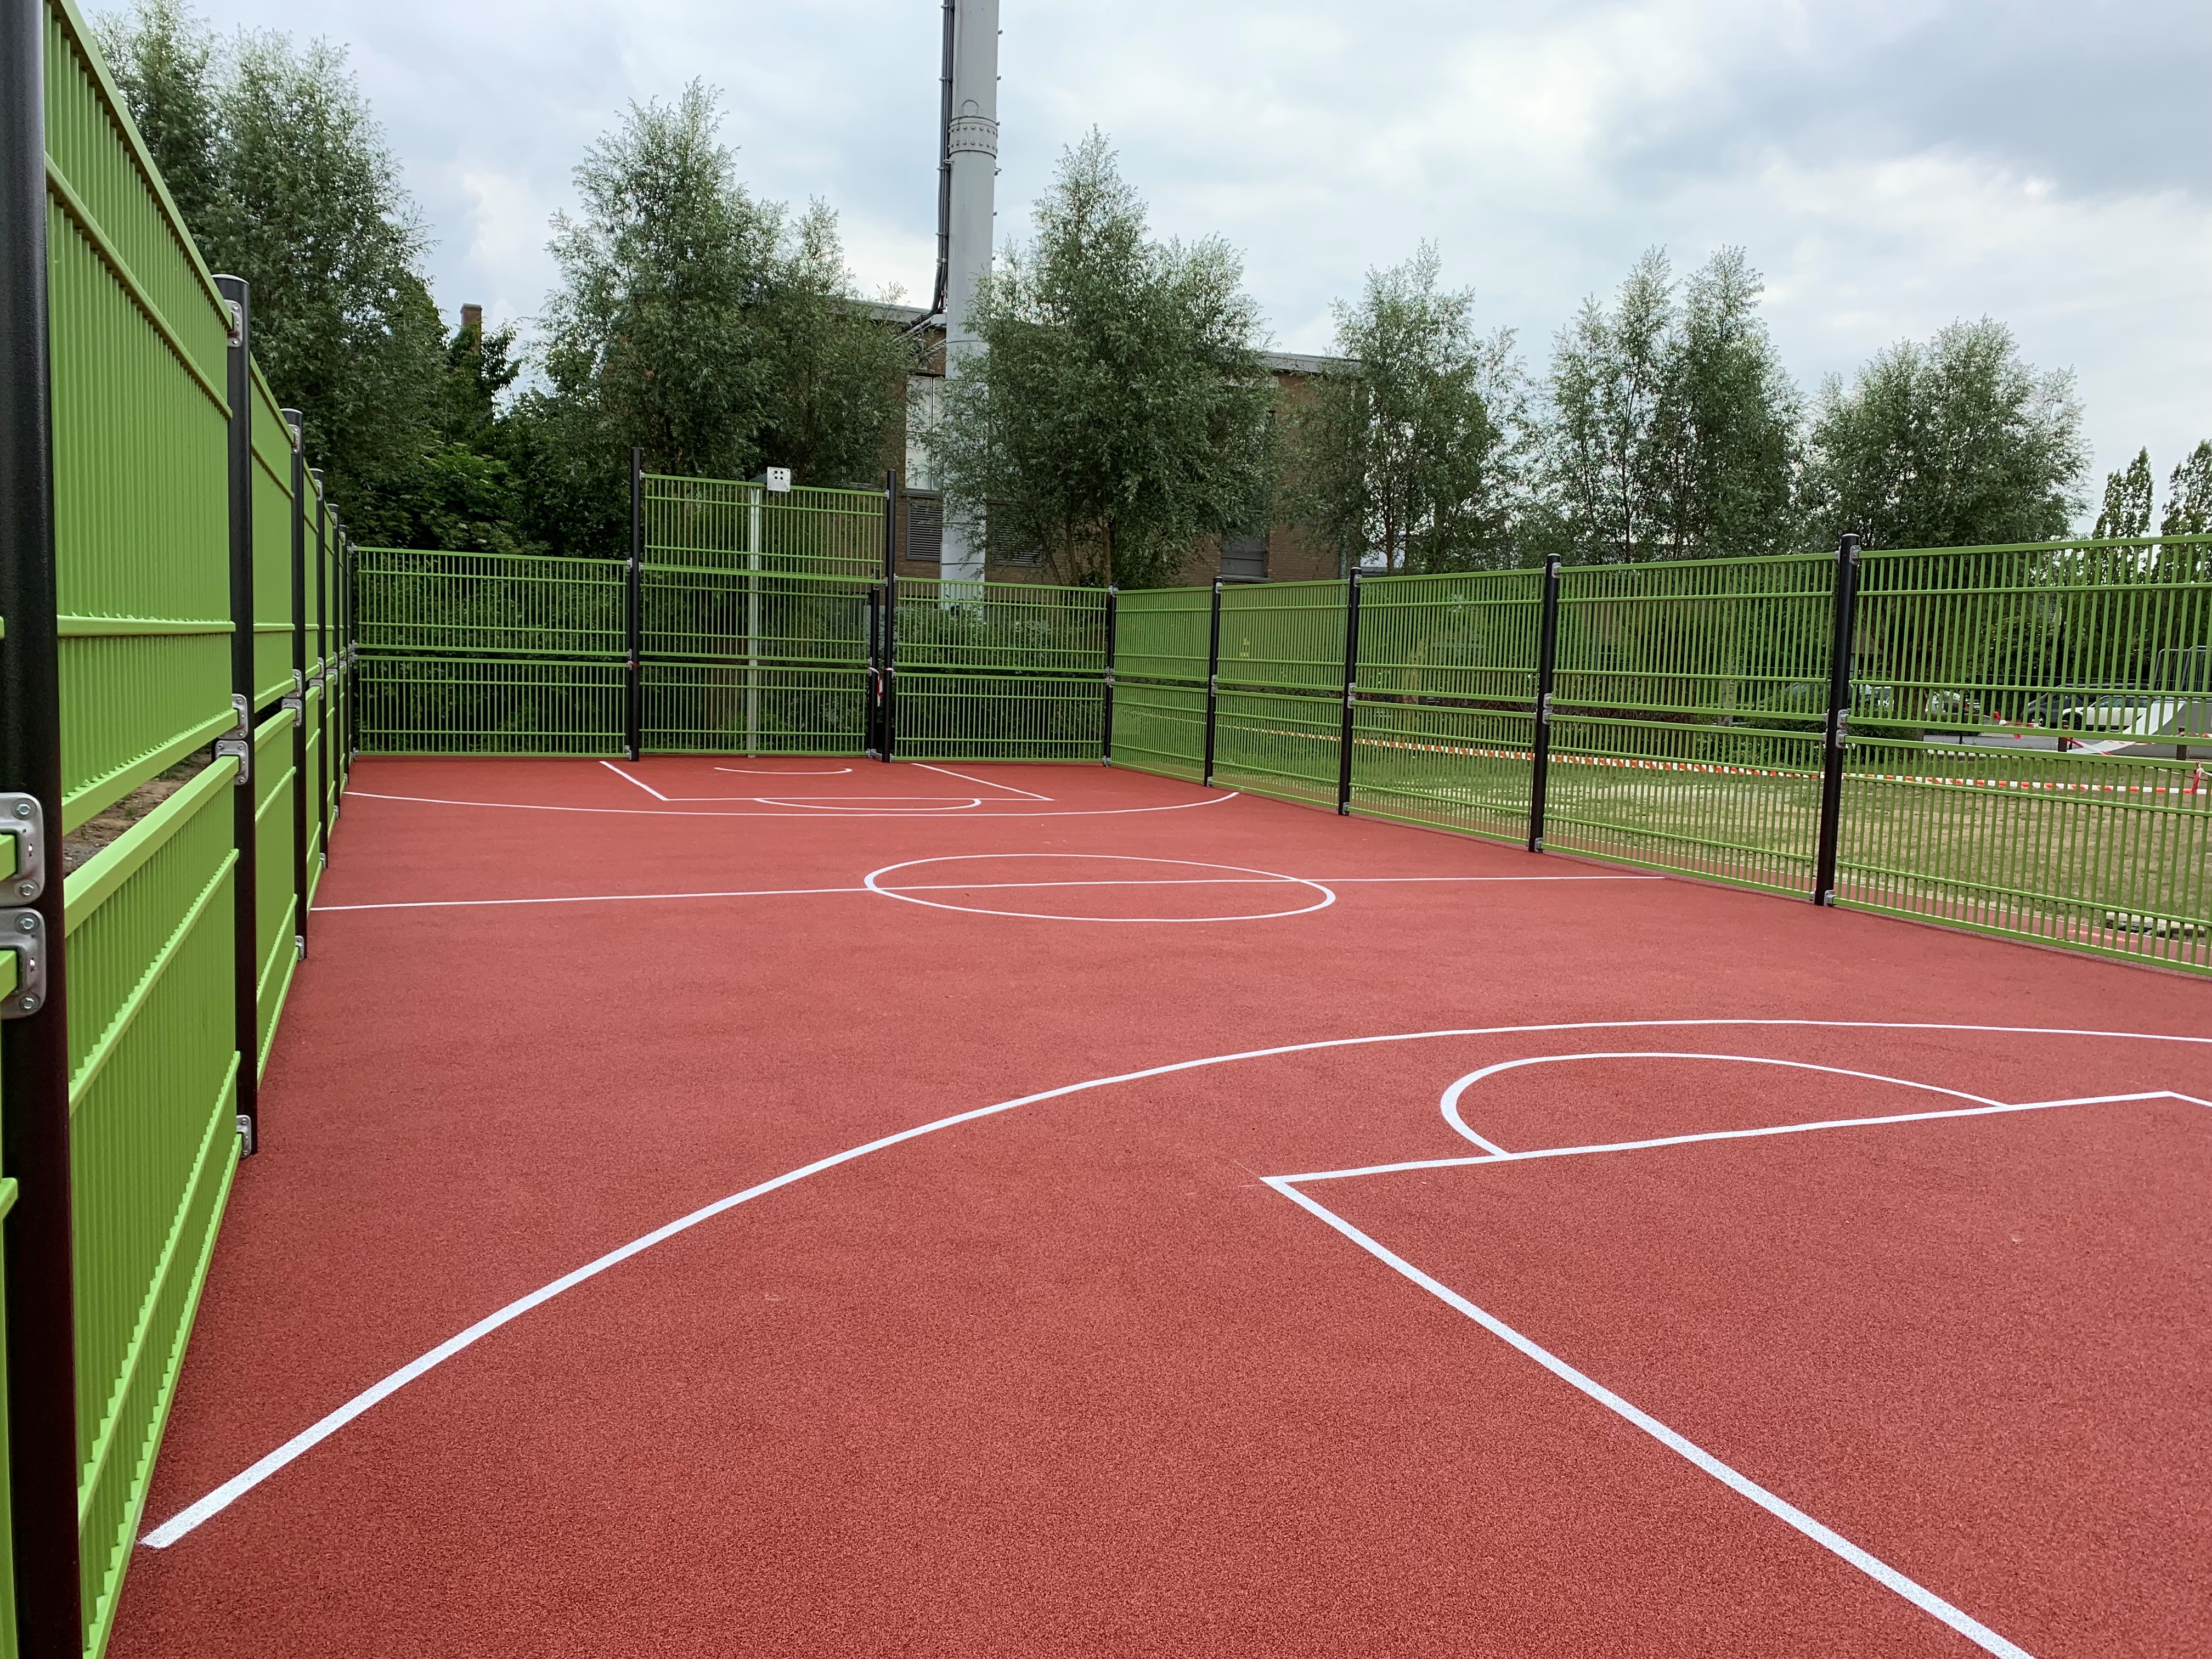 Ardooie (Sportcentrum)